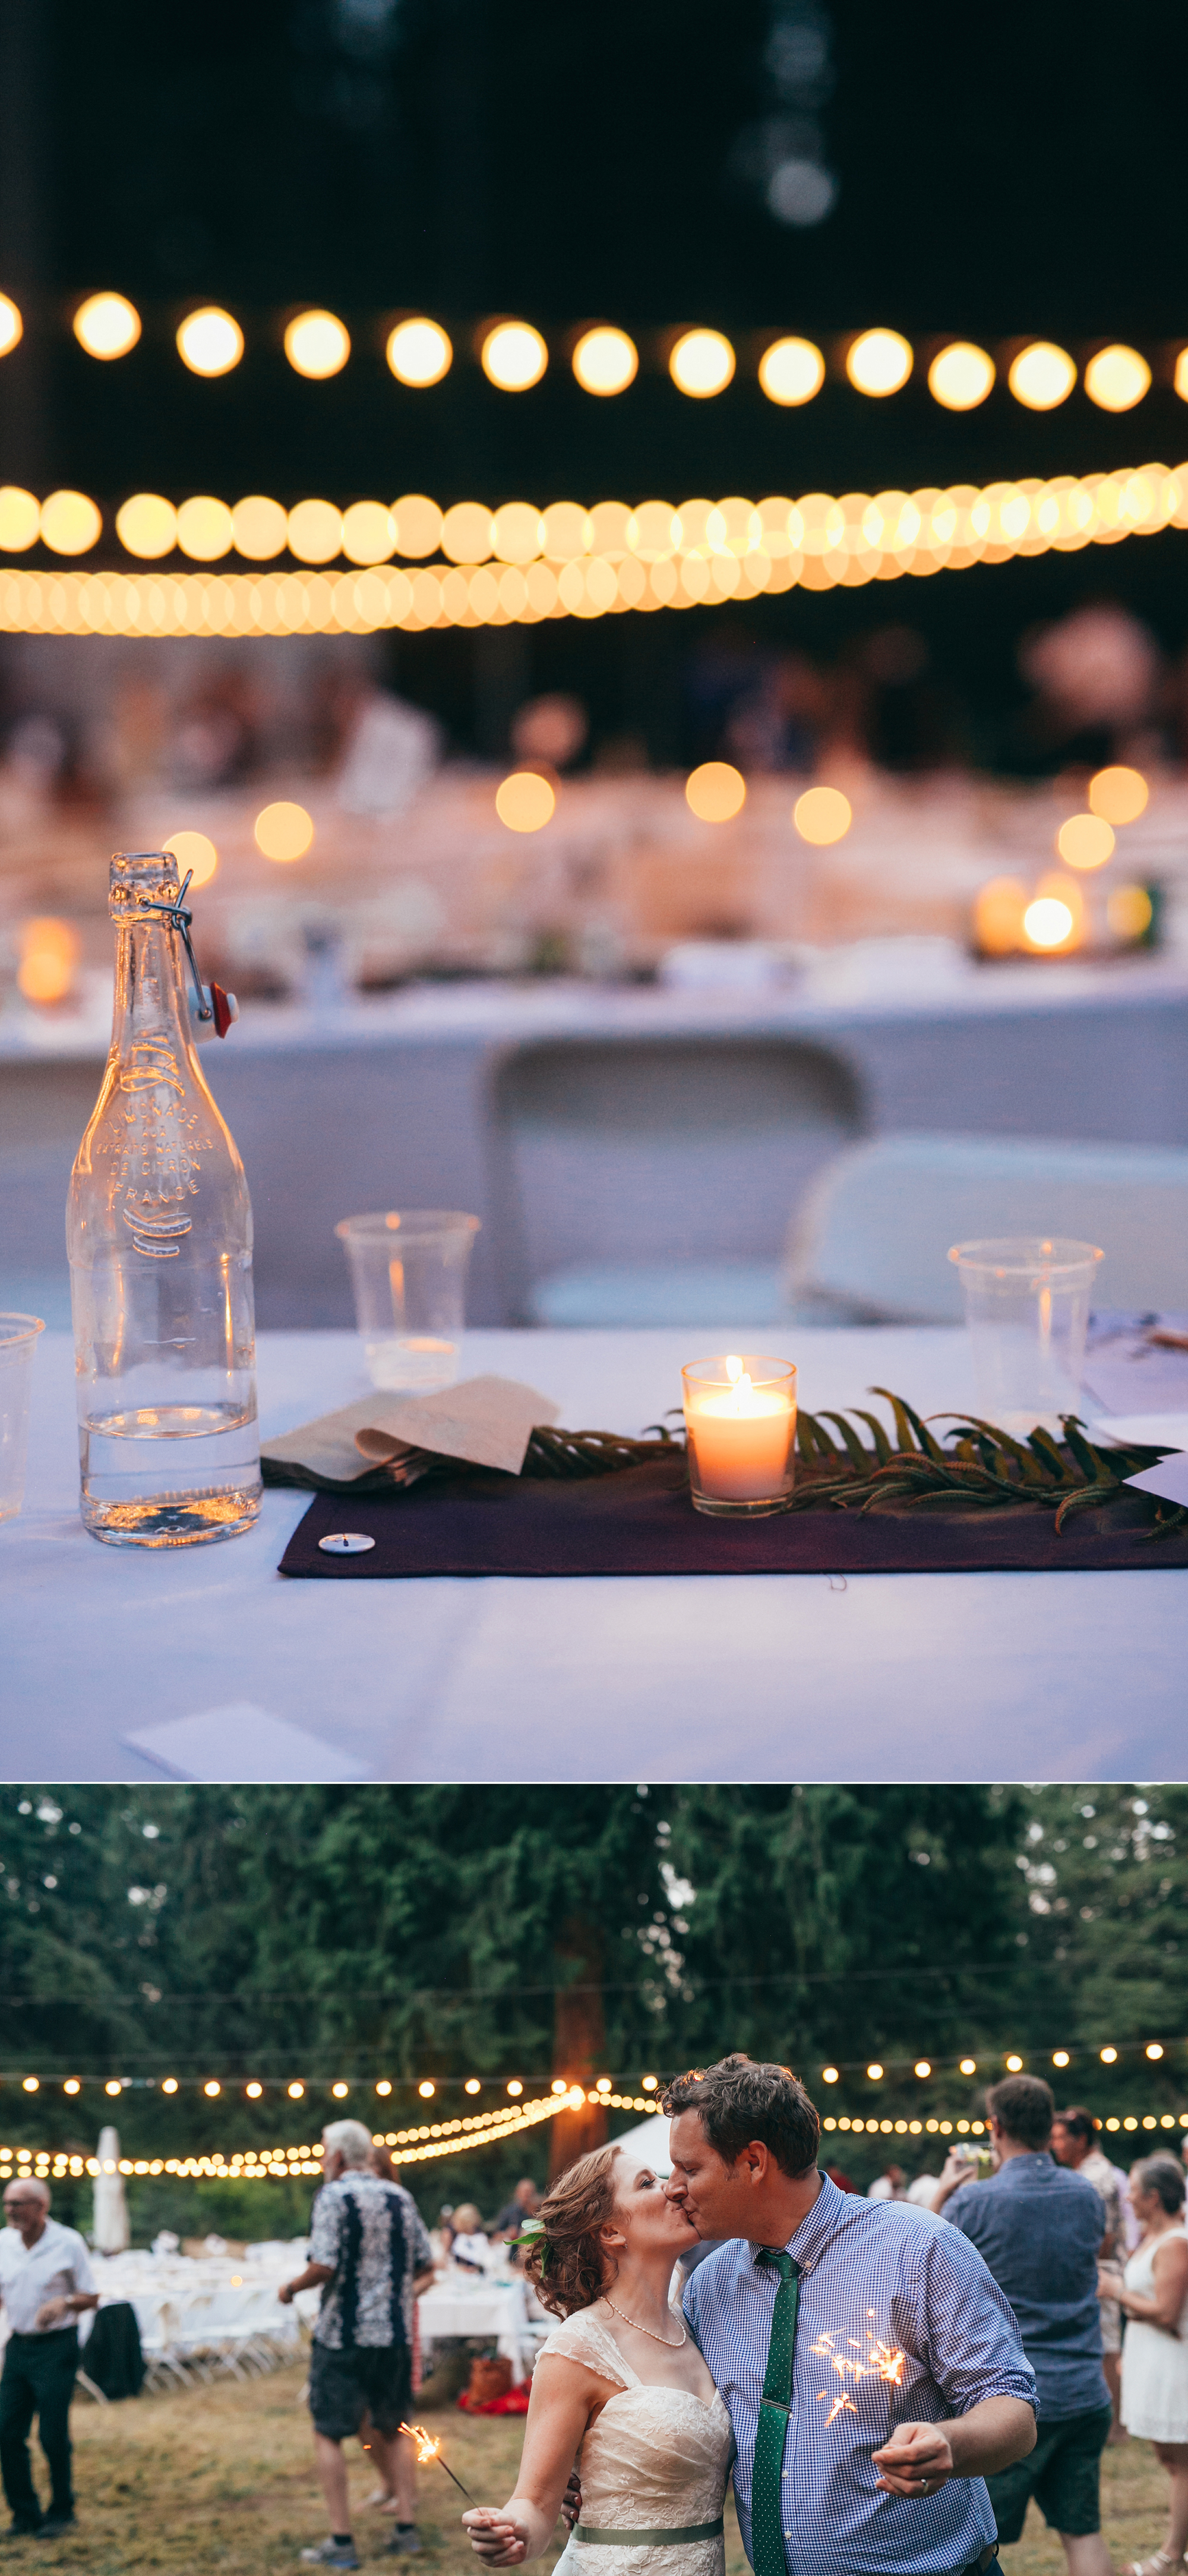 ashley vos photography seattle area wedding photographer_0721.jpg